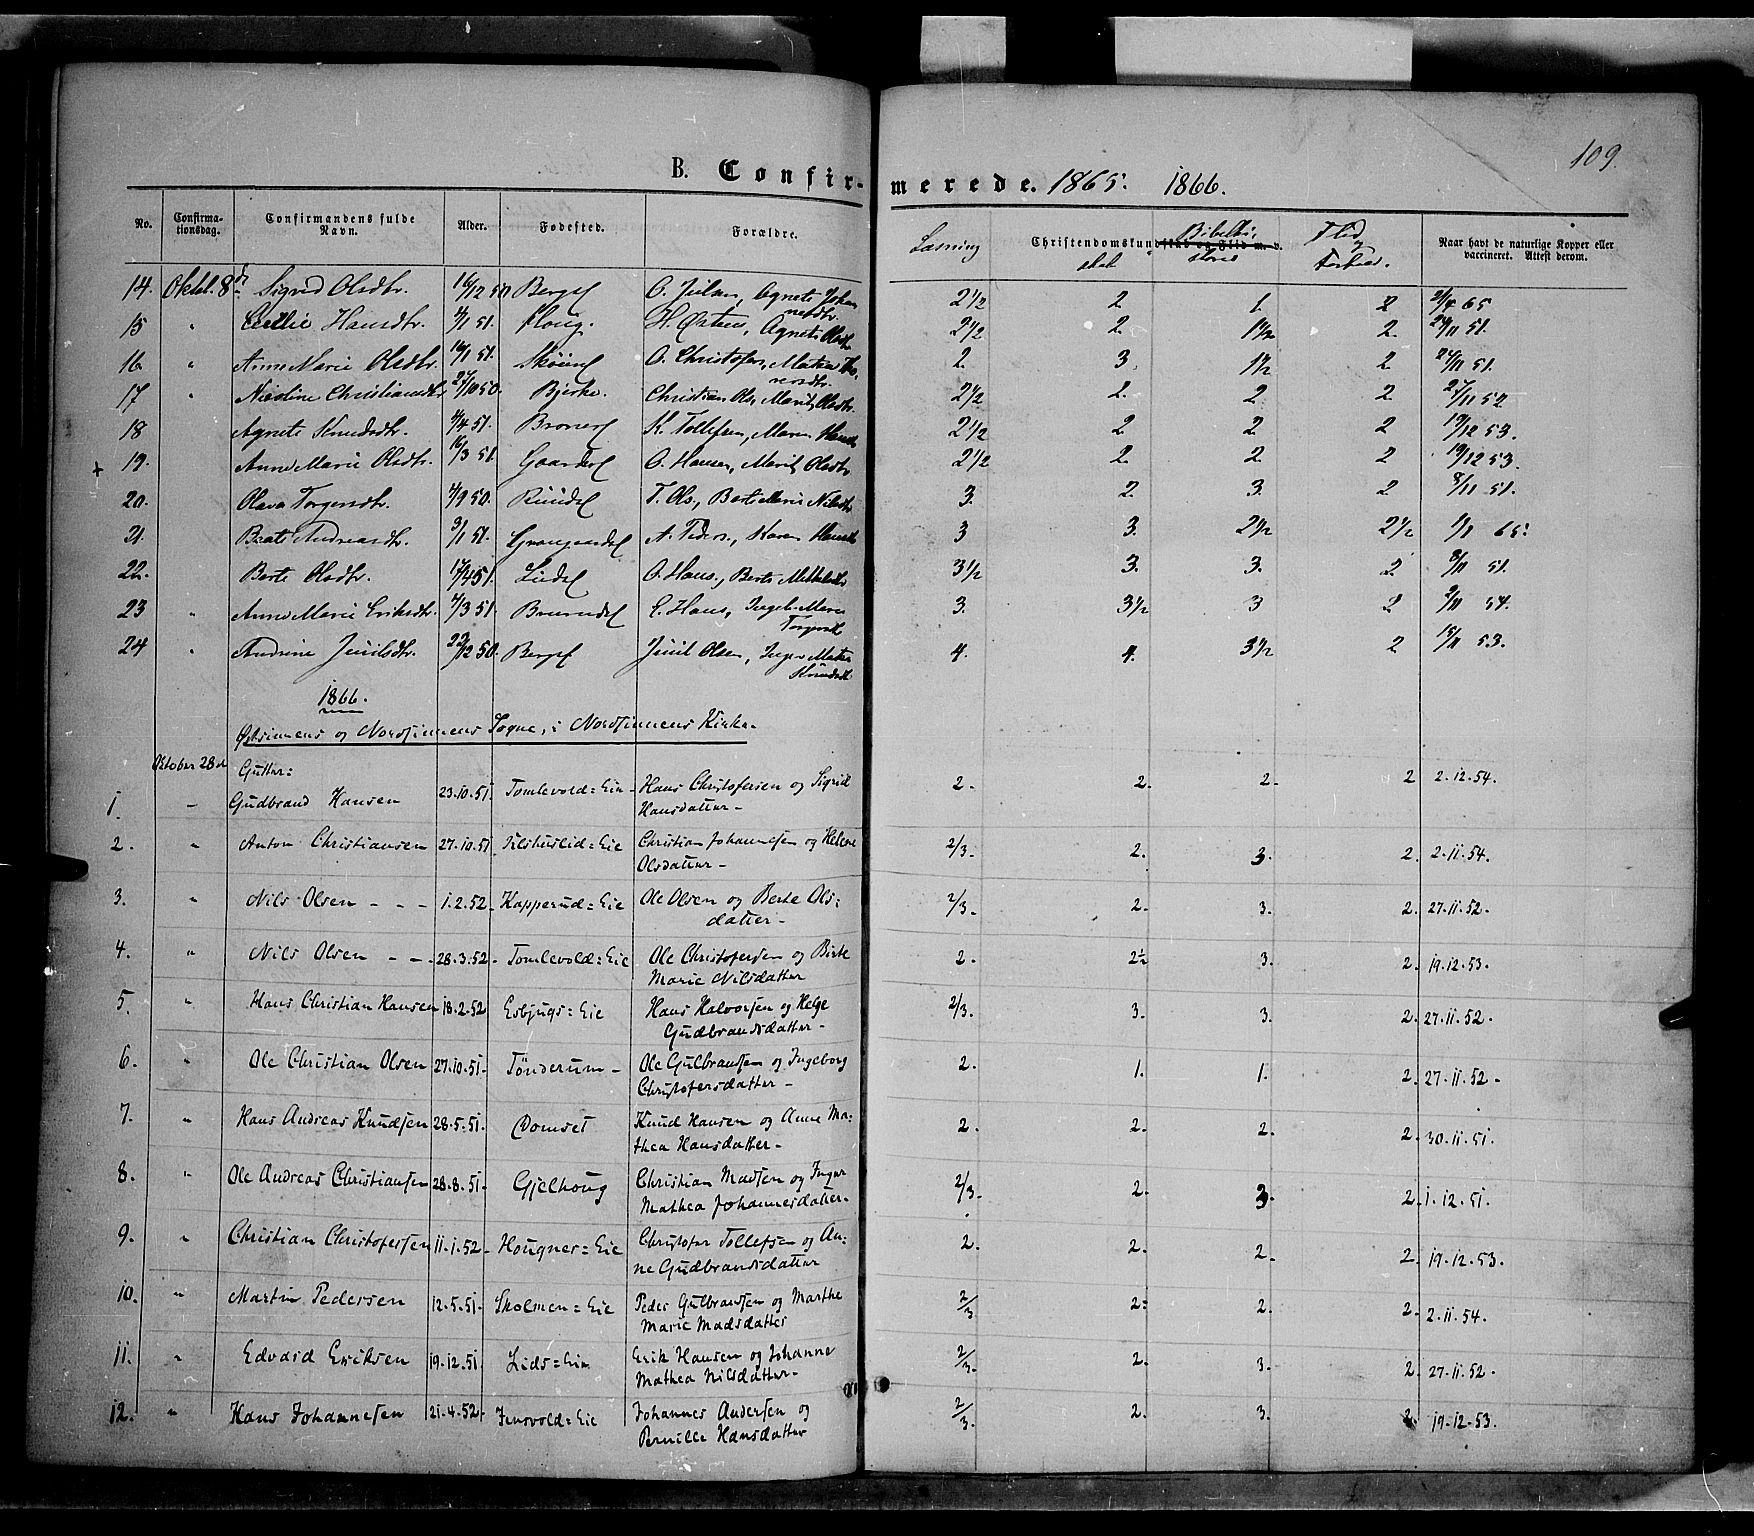 SAH, Nordre Land prestekontor, Ministerialbok nr. 1, 1860-1871, s. 109